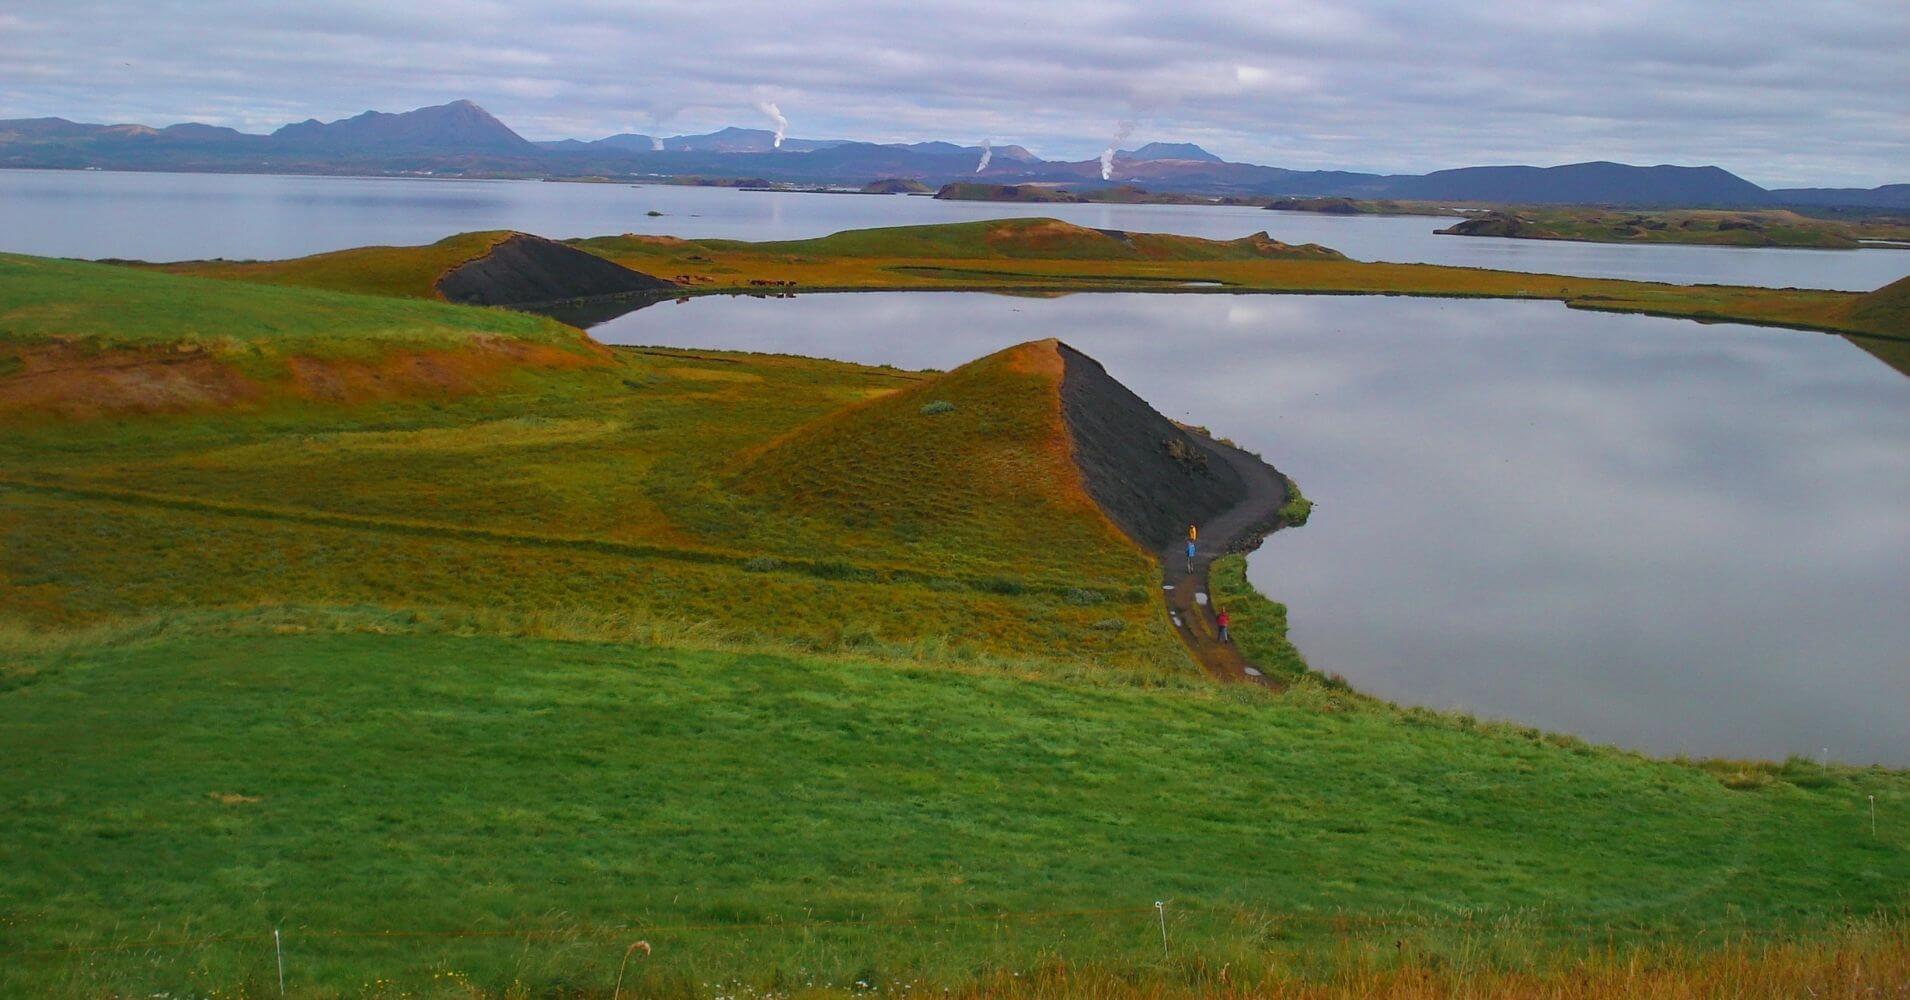 El Lago Mývatn. Norte de Islandia.